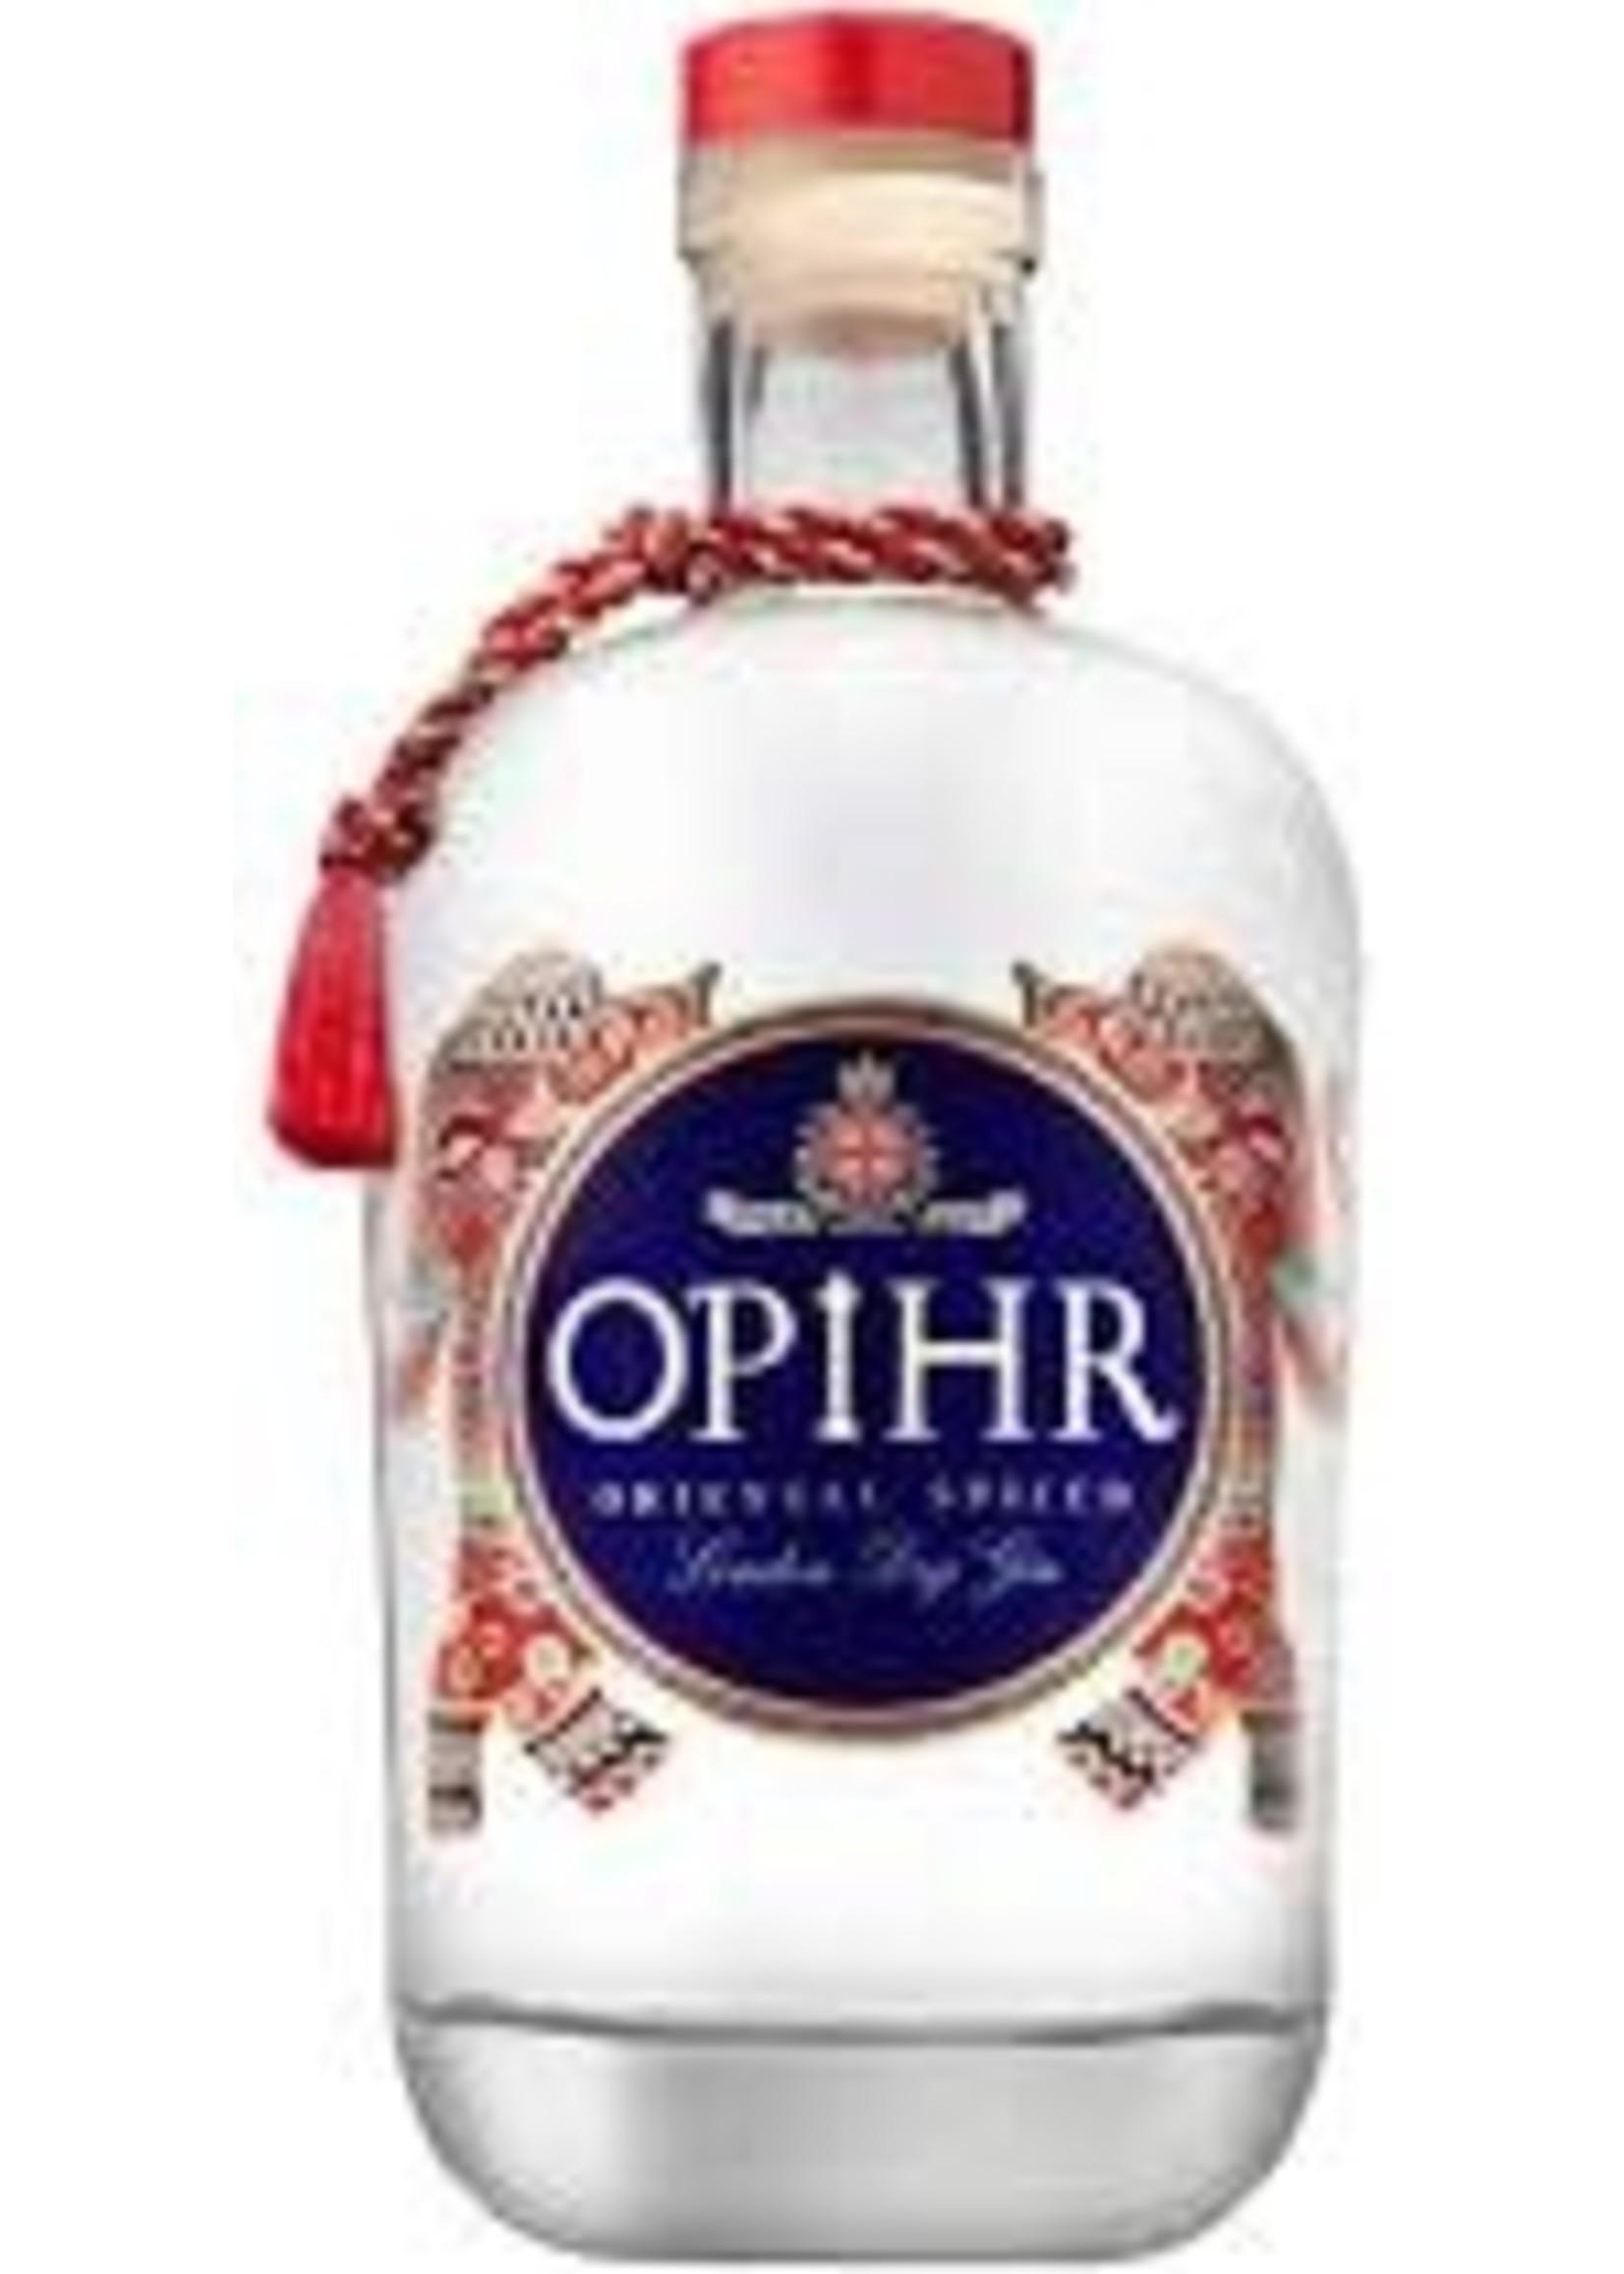 Opihr 'Oriental' Spiced London Dry Gin 750ml